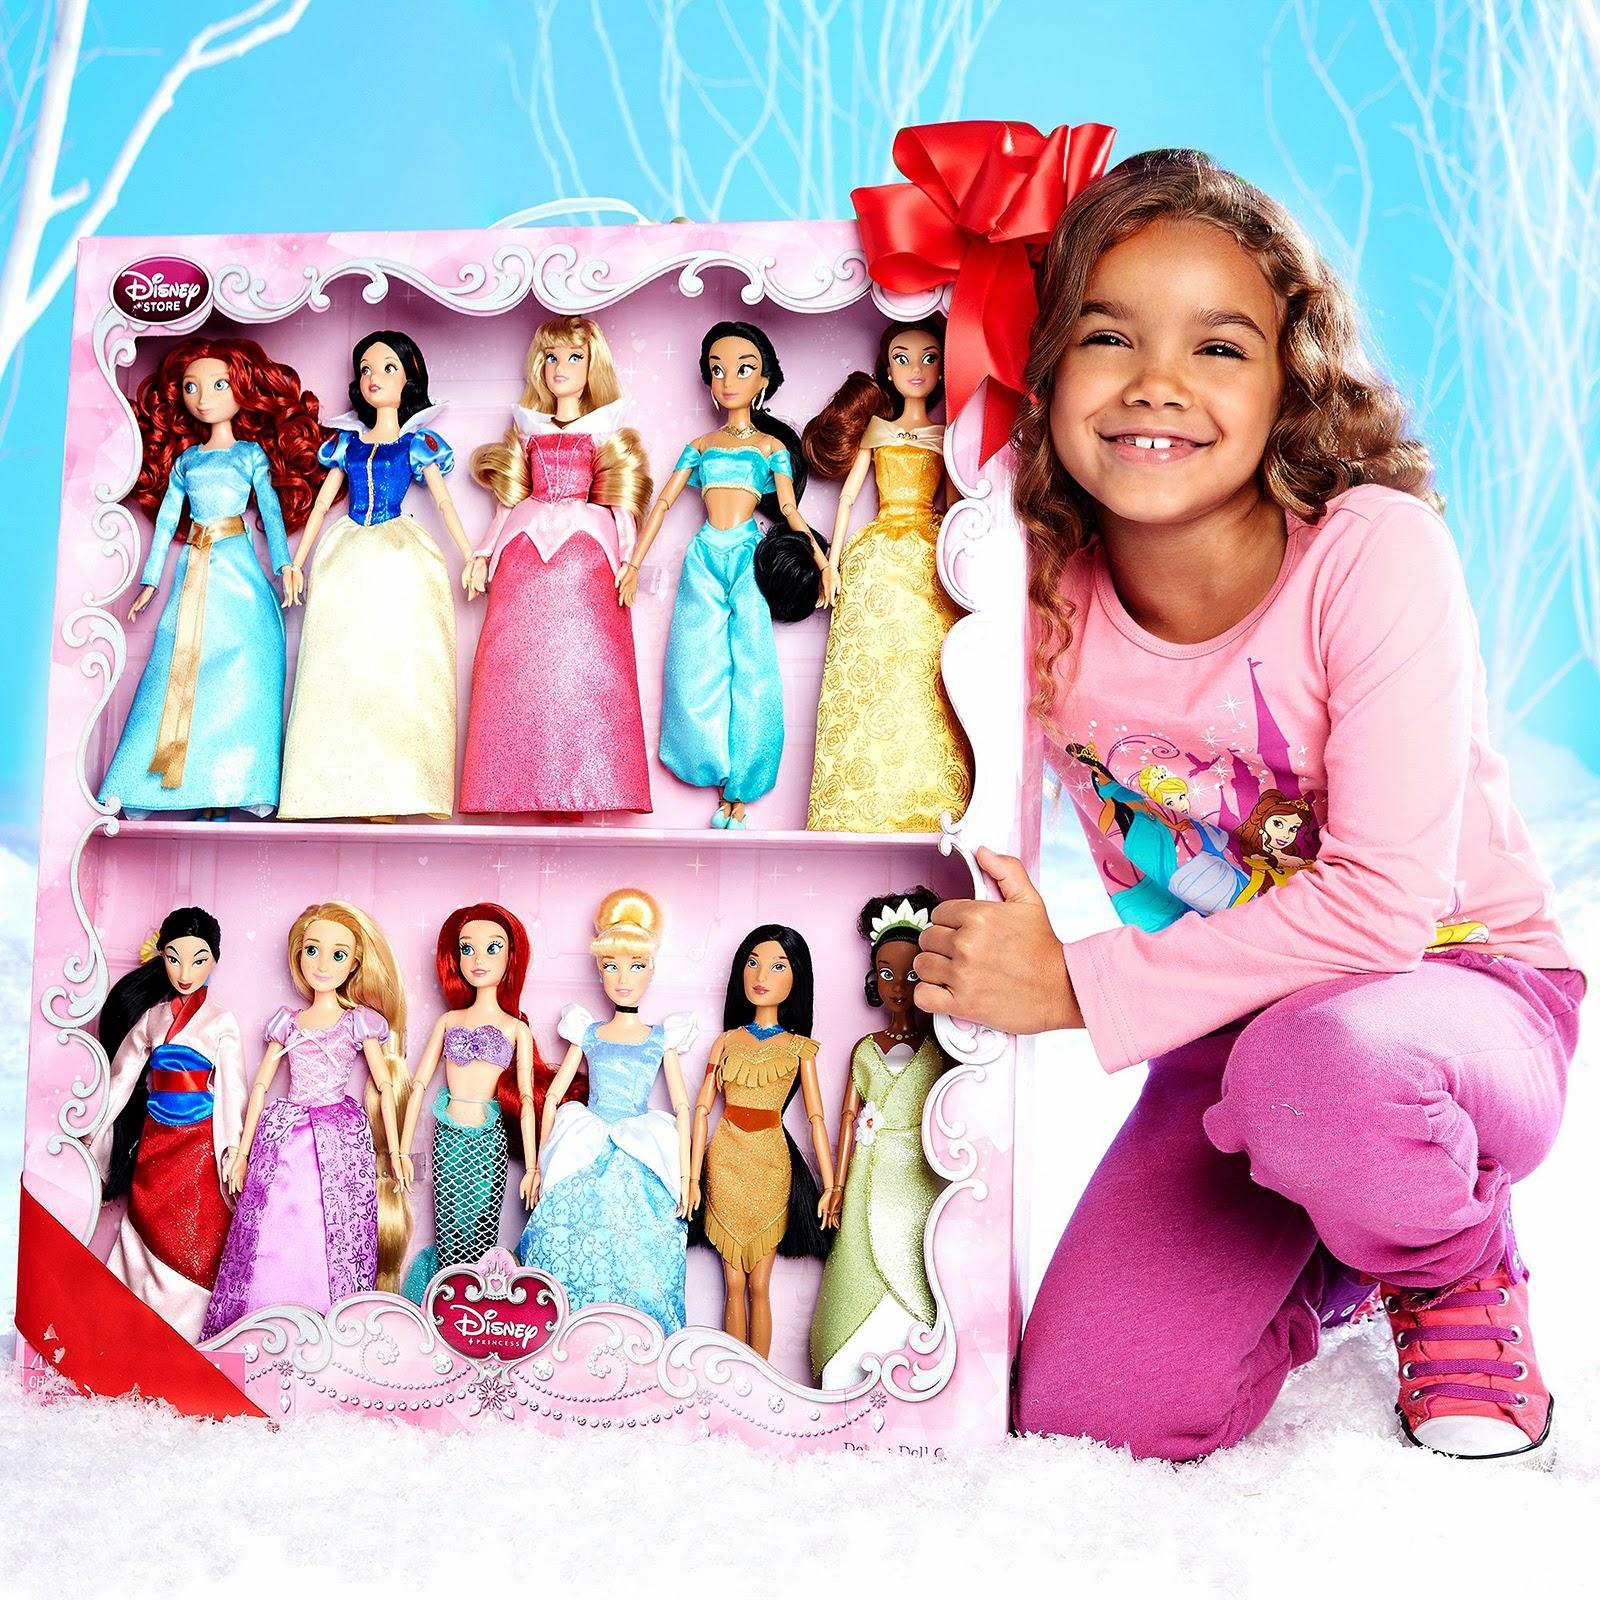 decb4e20ee Filmic Light - Snow White Archive  2014-15 Disney Princess Doll ...